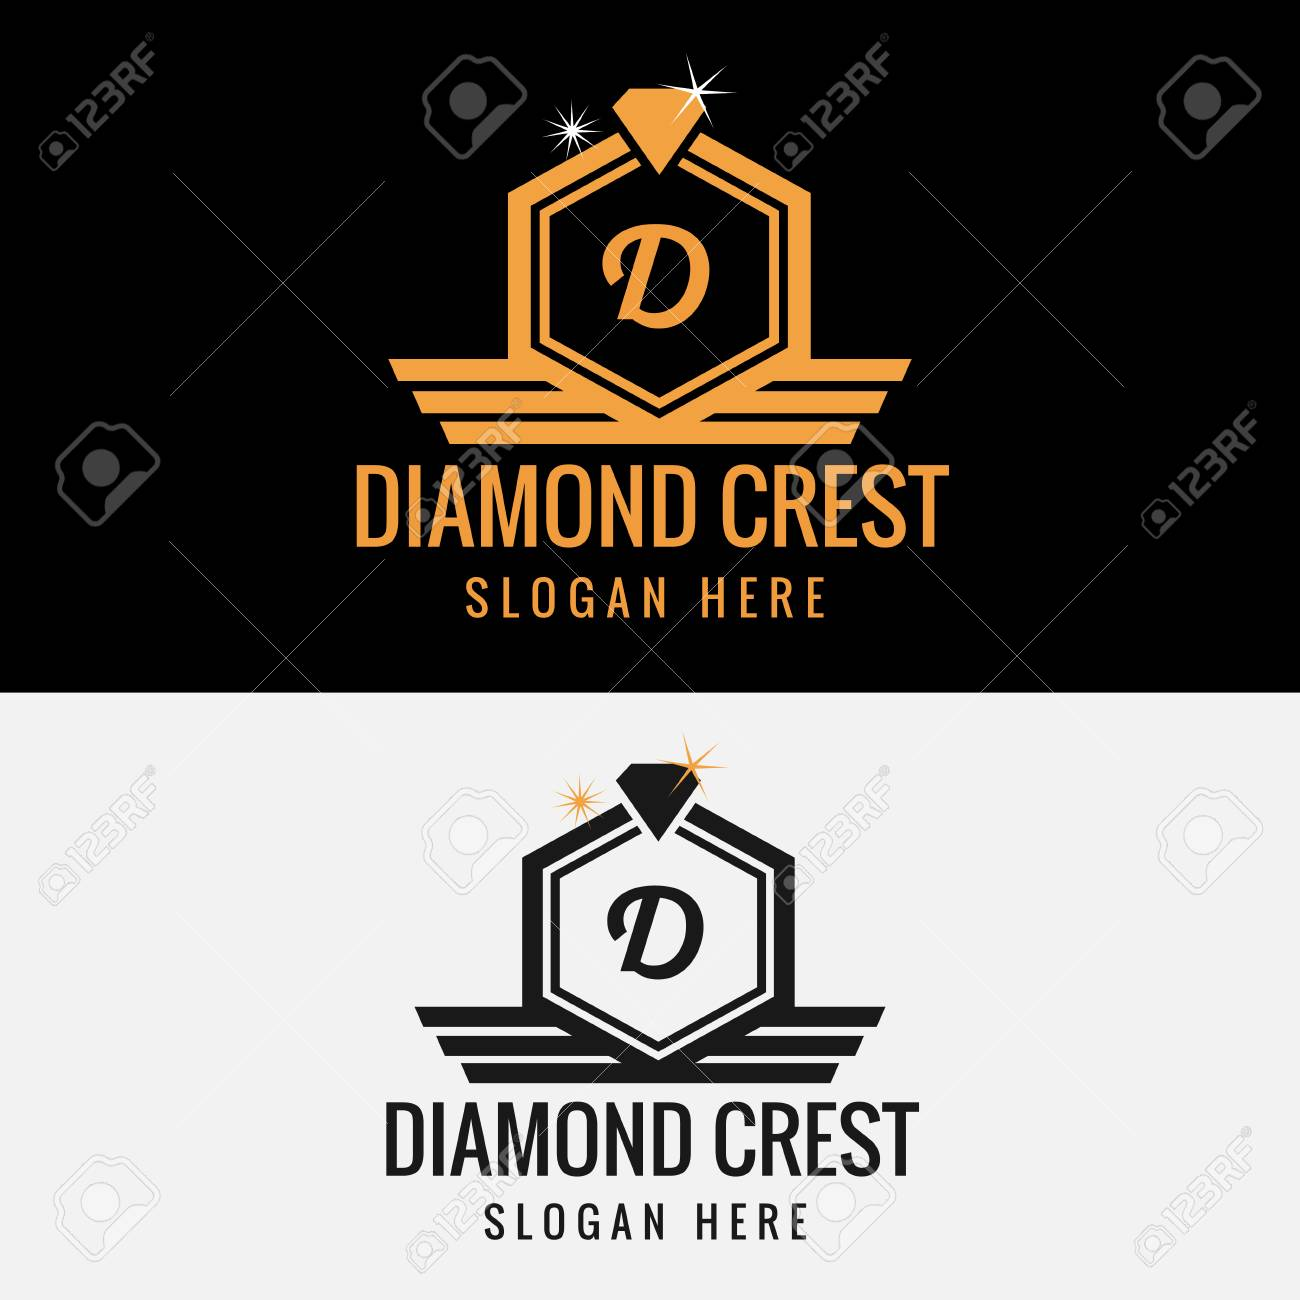 royal diamond crest logo template royalty free cliparts vectors